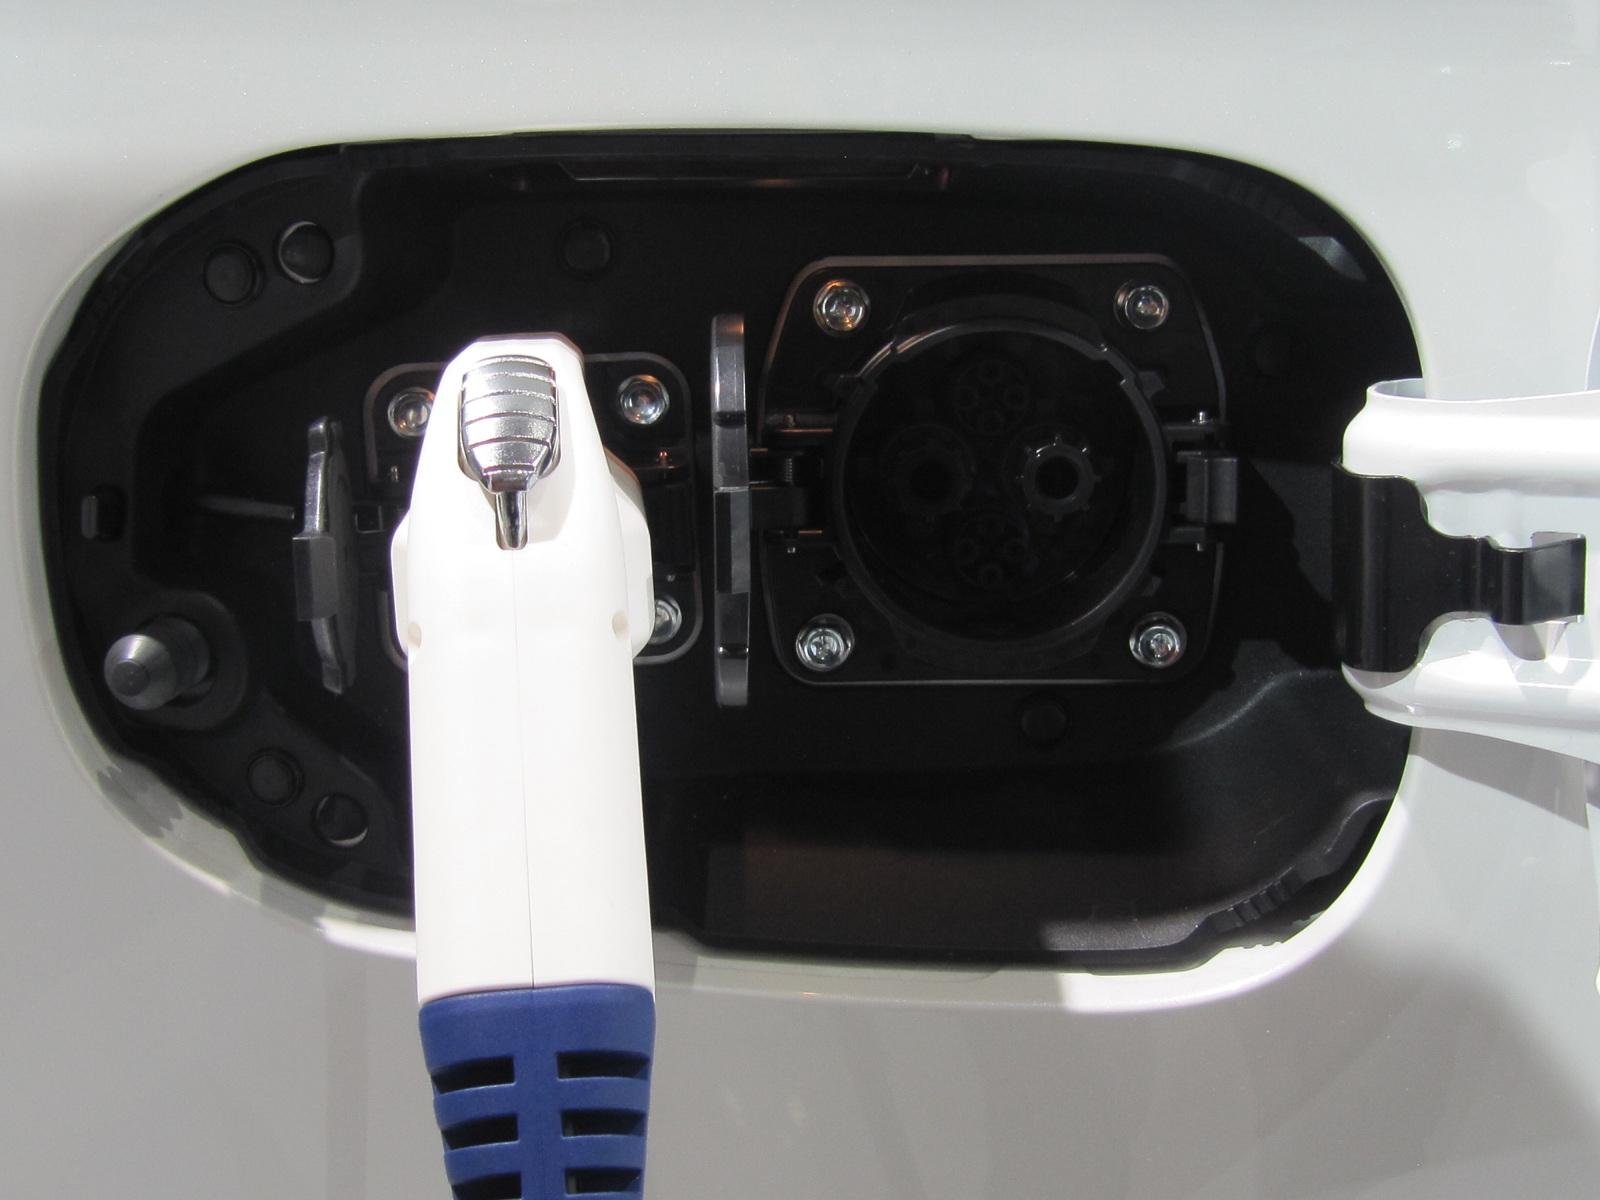 2017 Mitsubishi Plug In Hybrid To Lose Quick Charging Port